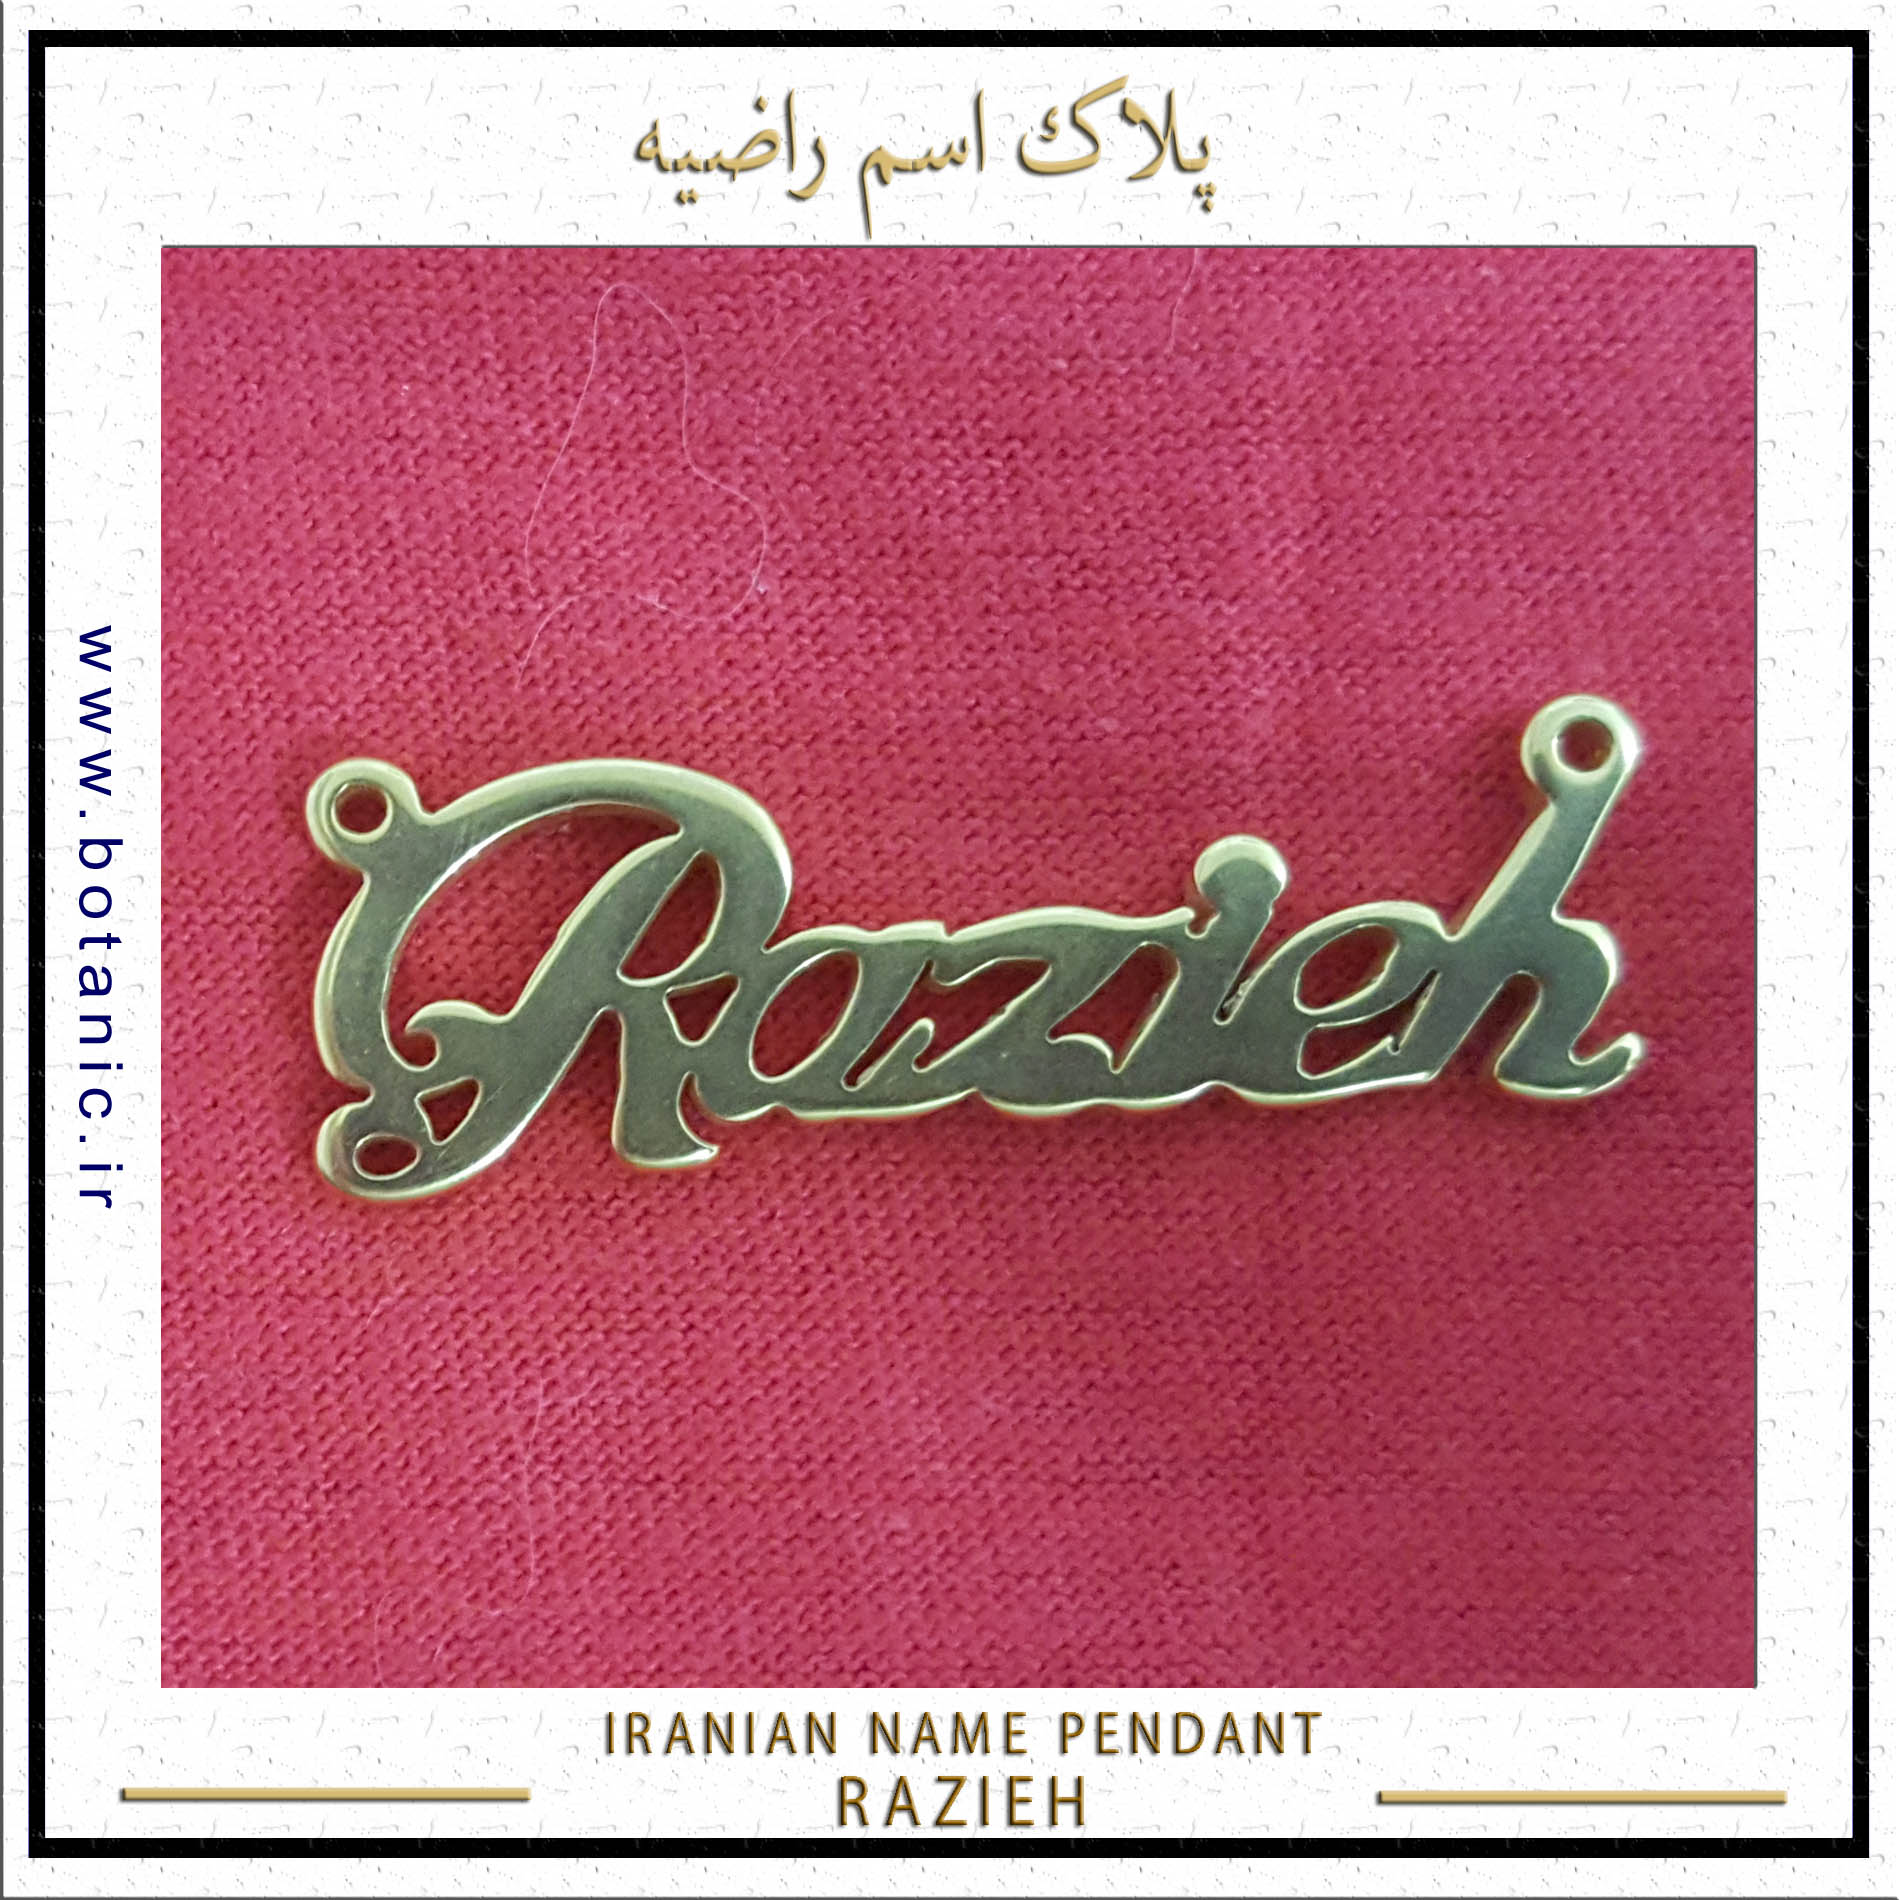 Iranian Name Pendant Razieh